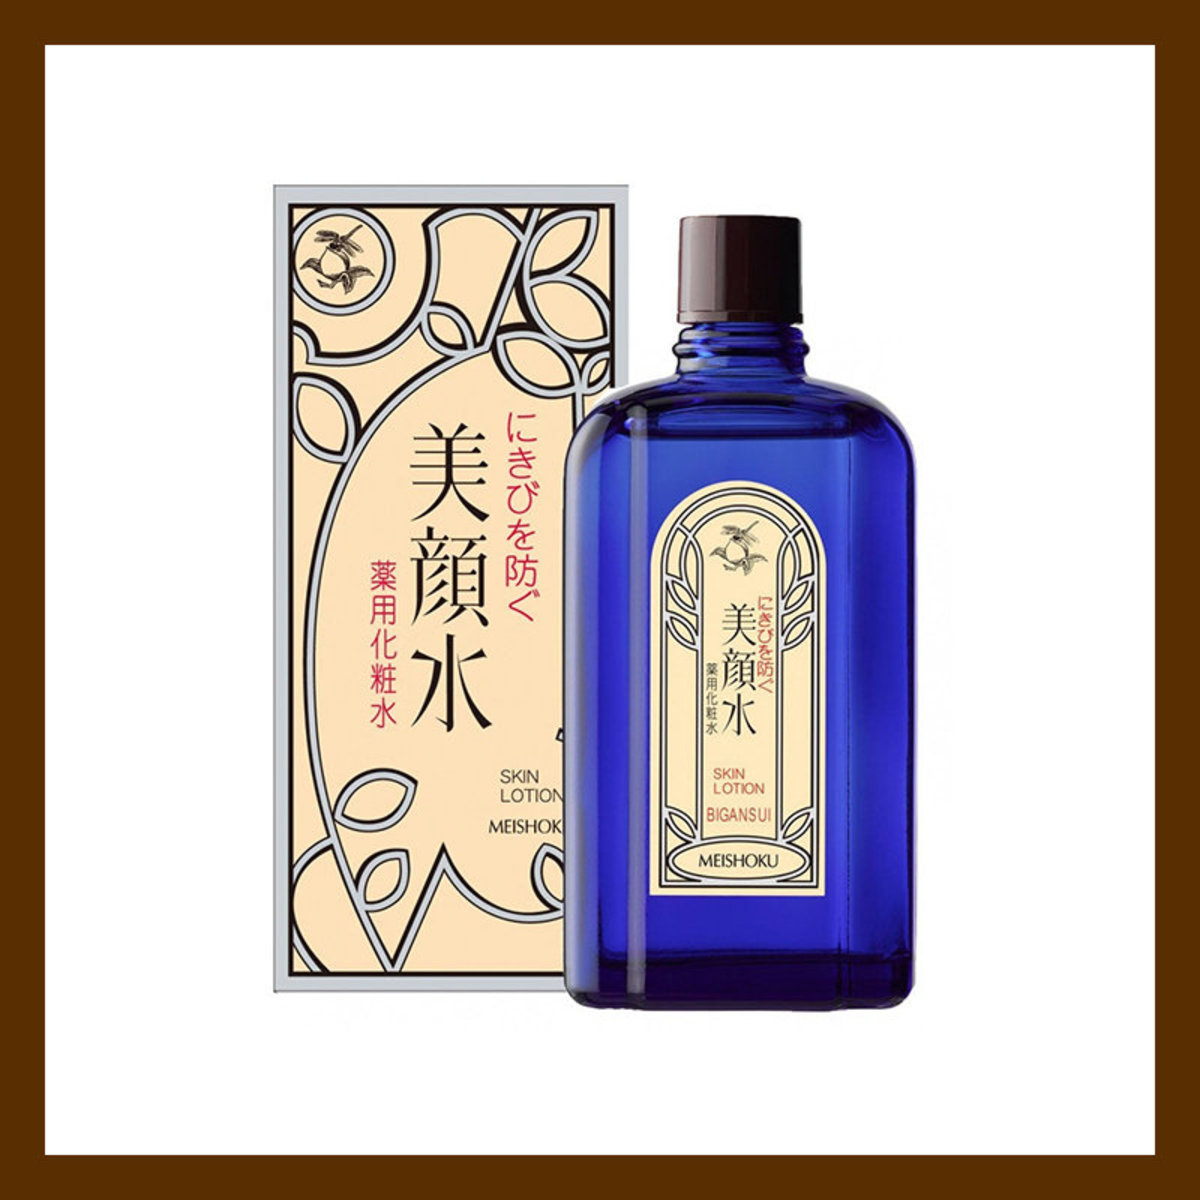 MEISHOKU Skin Lotion 明色 美顏粉刺專用精華化妝水 90ml(4902468113154)